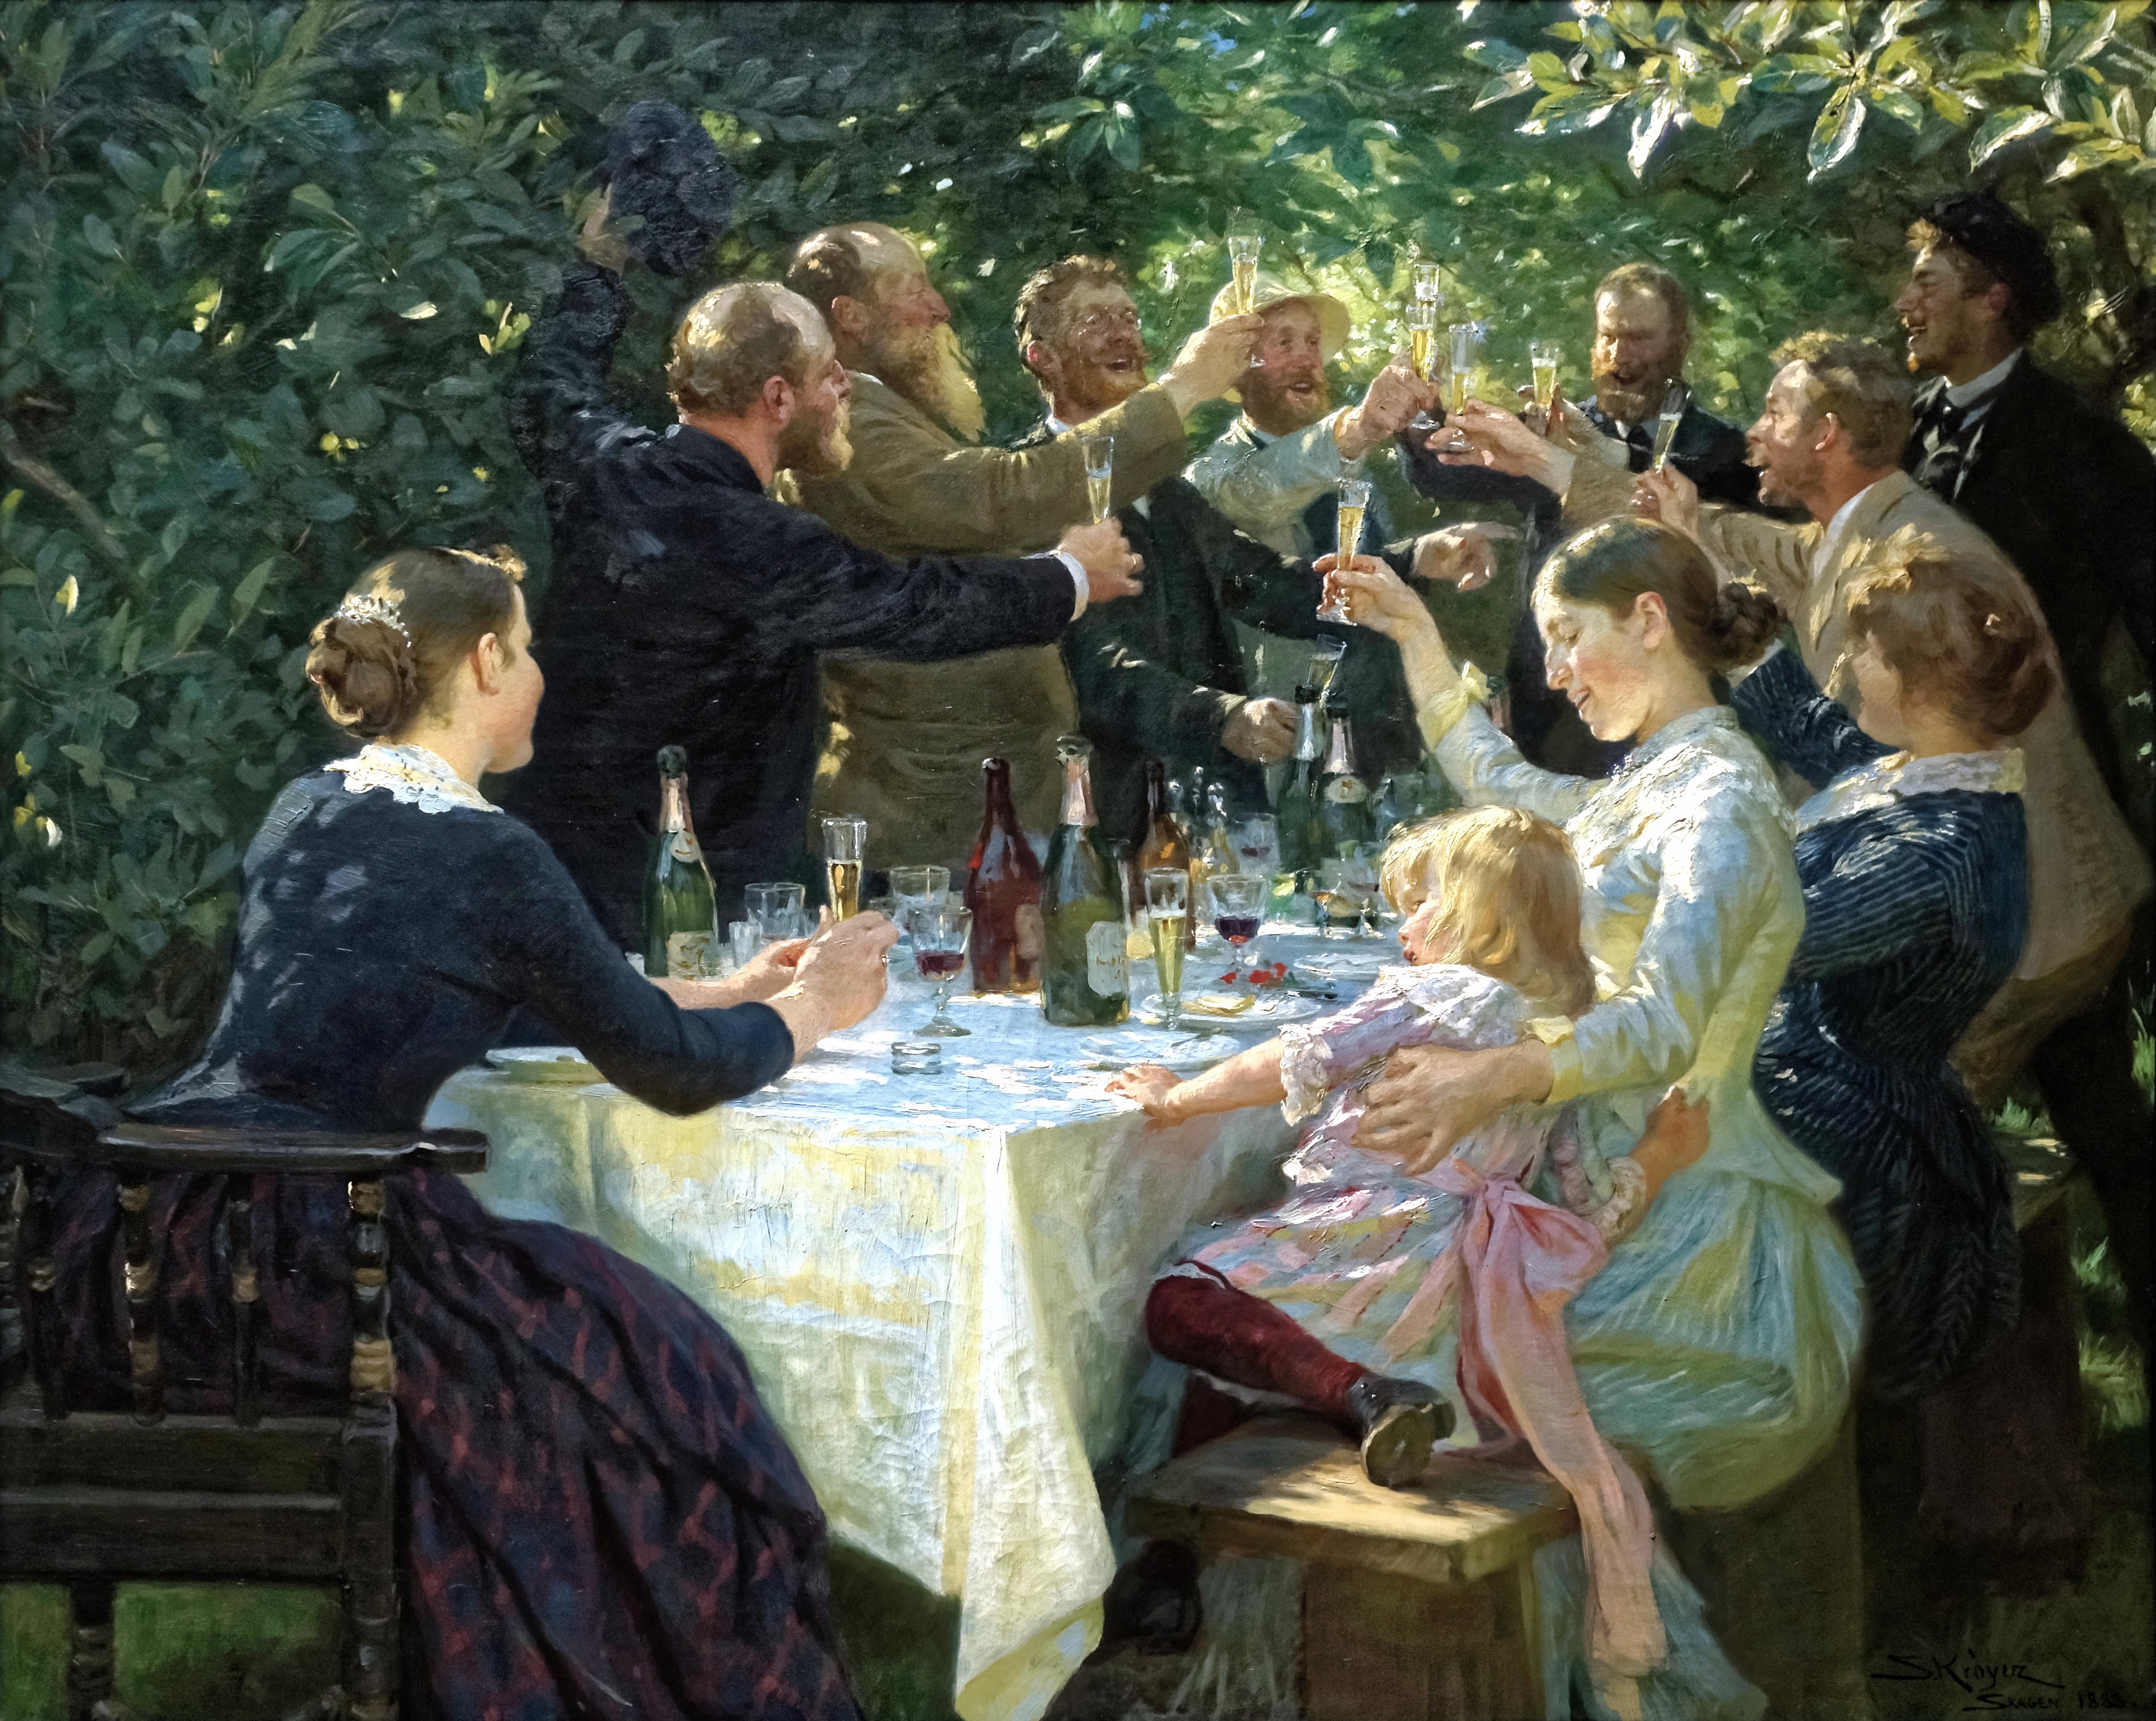 'Hip,_Hip,_Hurrah!_Artist_Festival_at_Skagen',_by_Peder_Severin_Krøyer_(1888)_Demisted_with_DXO_PhotoLab_Clearview;_cropped_away_black_border_edge